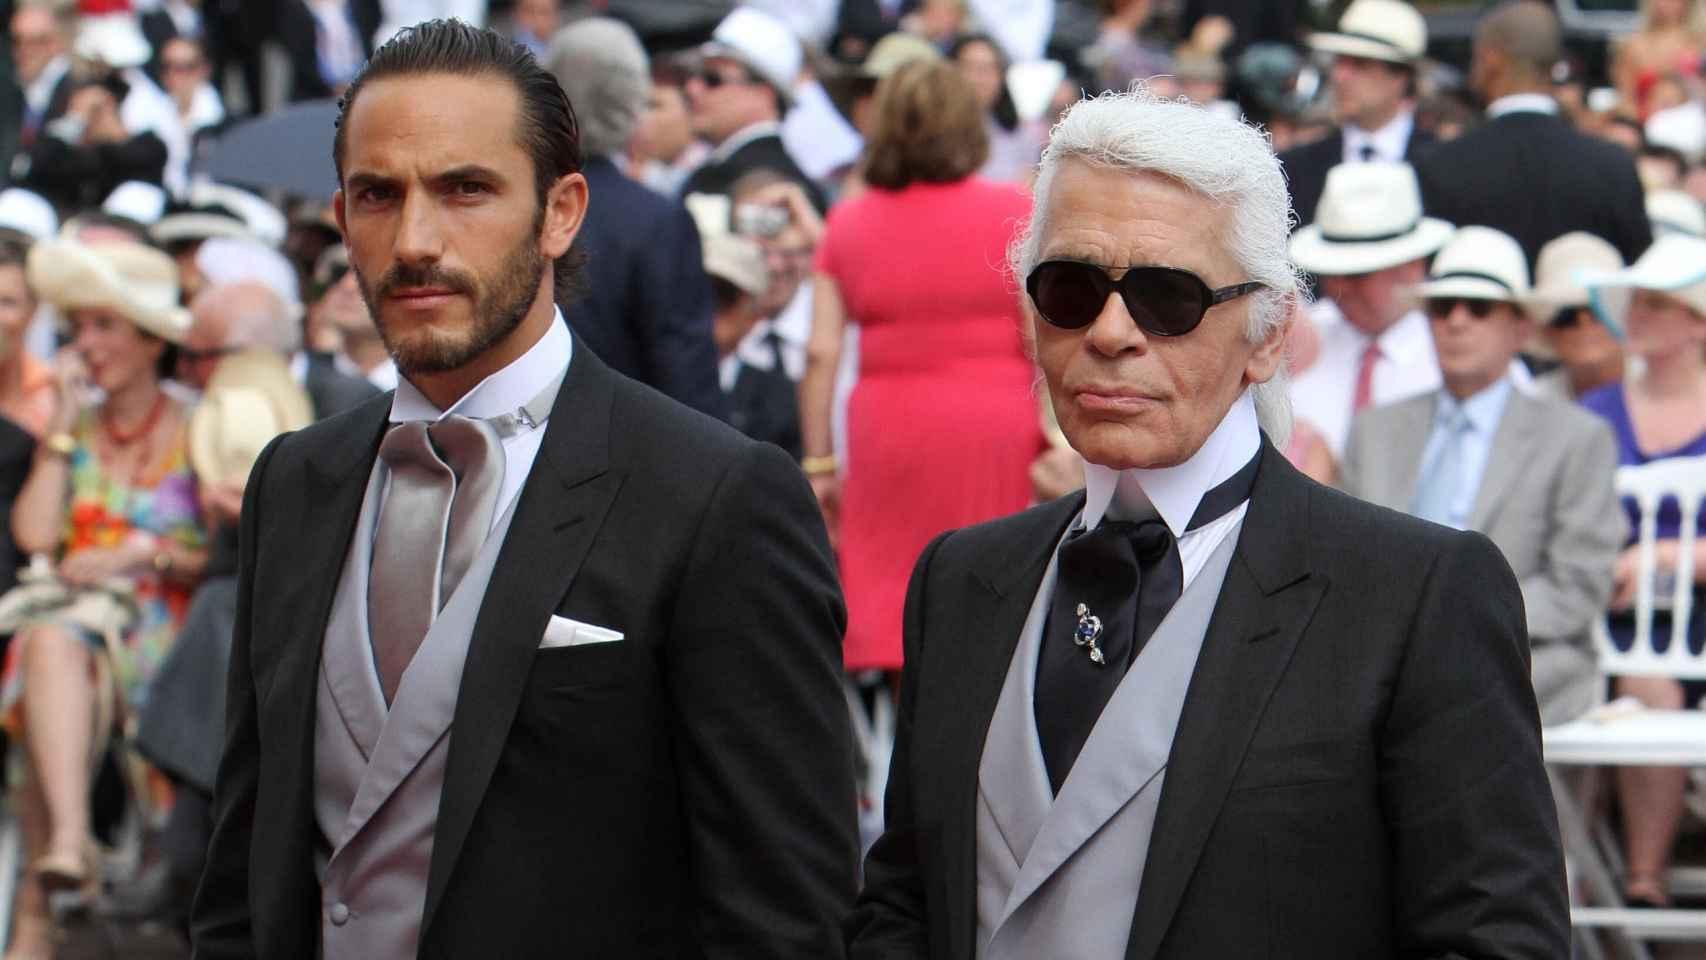 Sebastien Jondeau estuvo durante 20 años junto a Karl Lagerfeld.